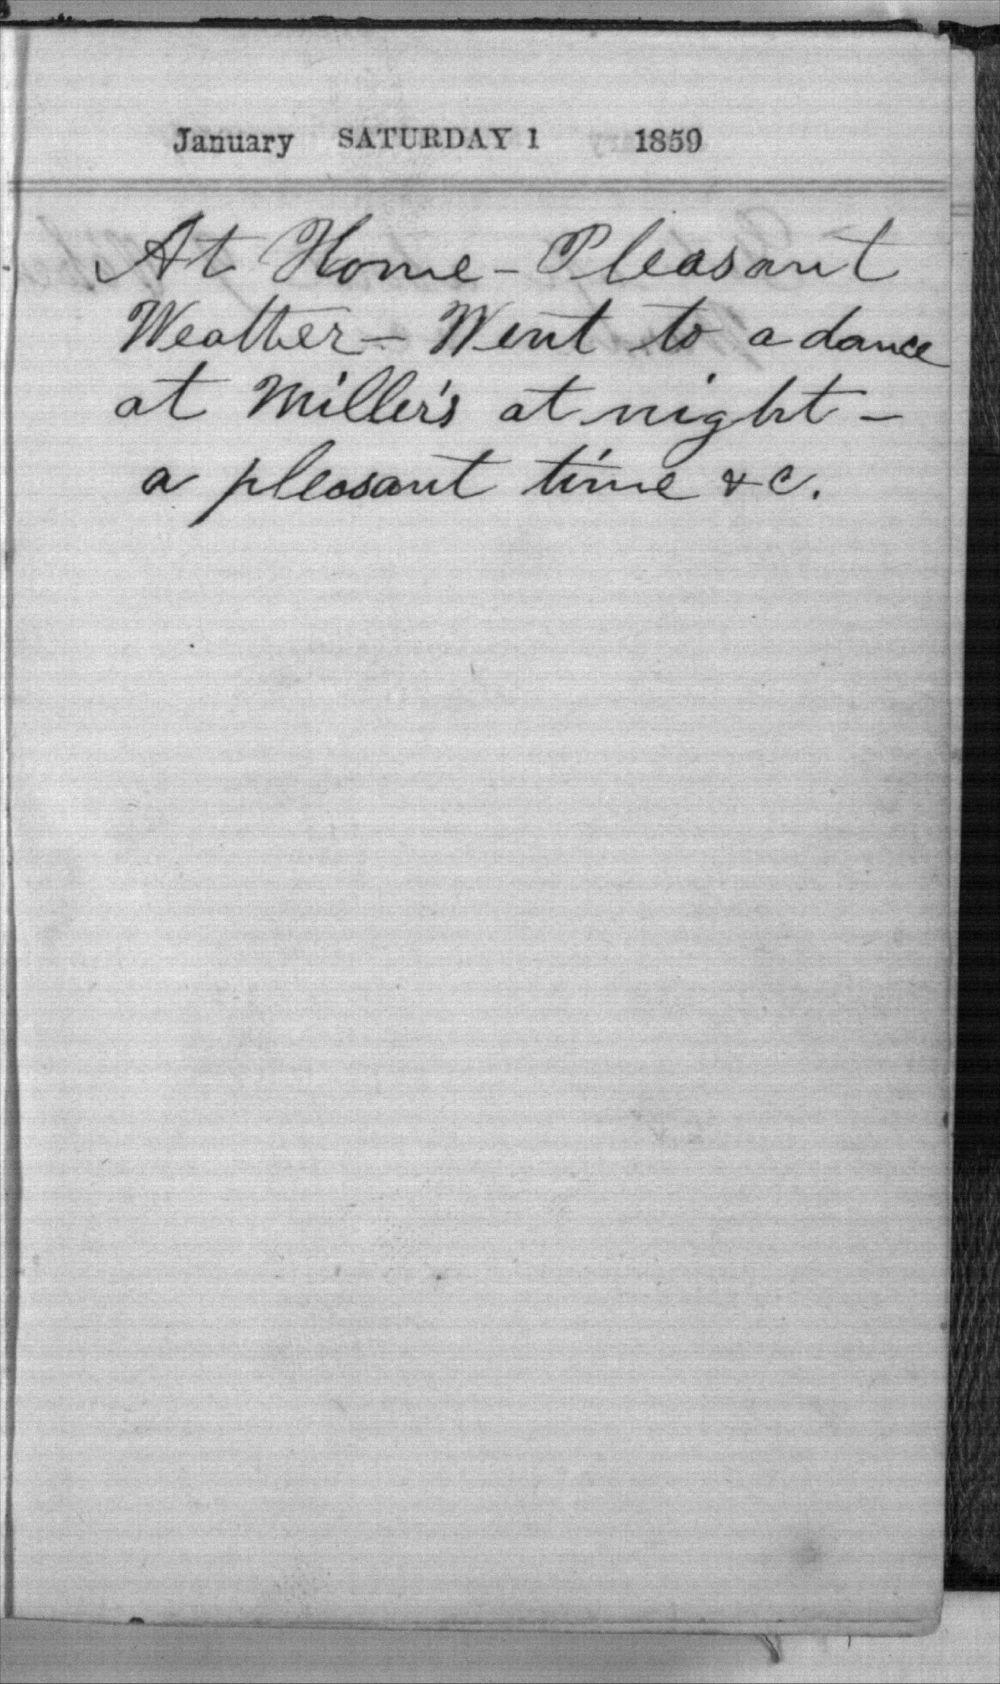 Daniel Mulford Valentine's diary - Jan 1